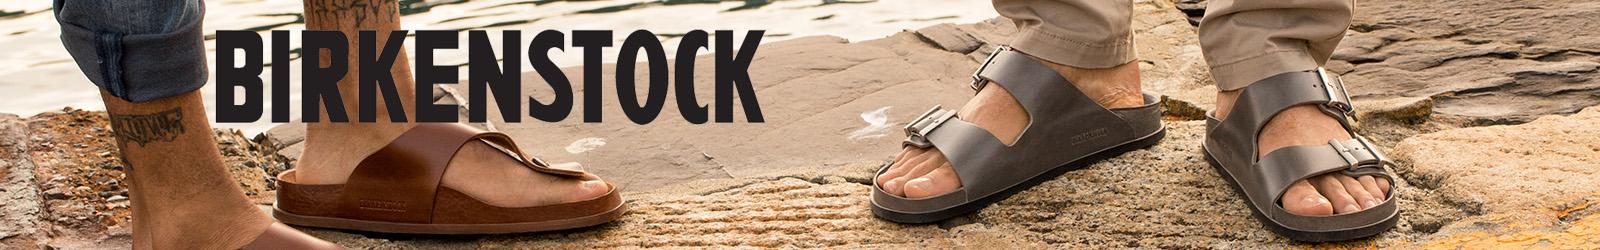 19466aeecb6 Birkenstock Sandals and Footwear at Moosejaw.com